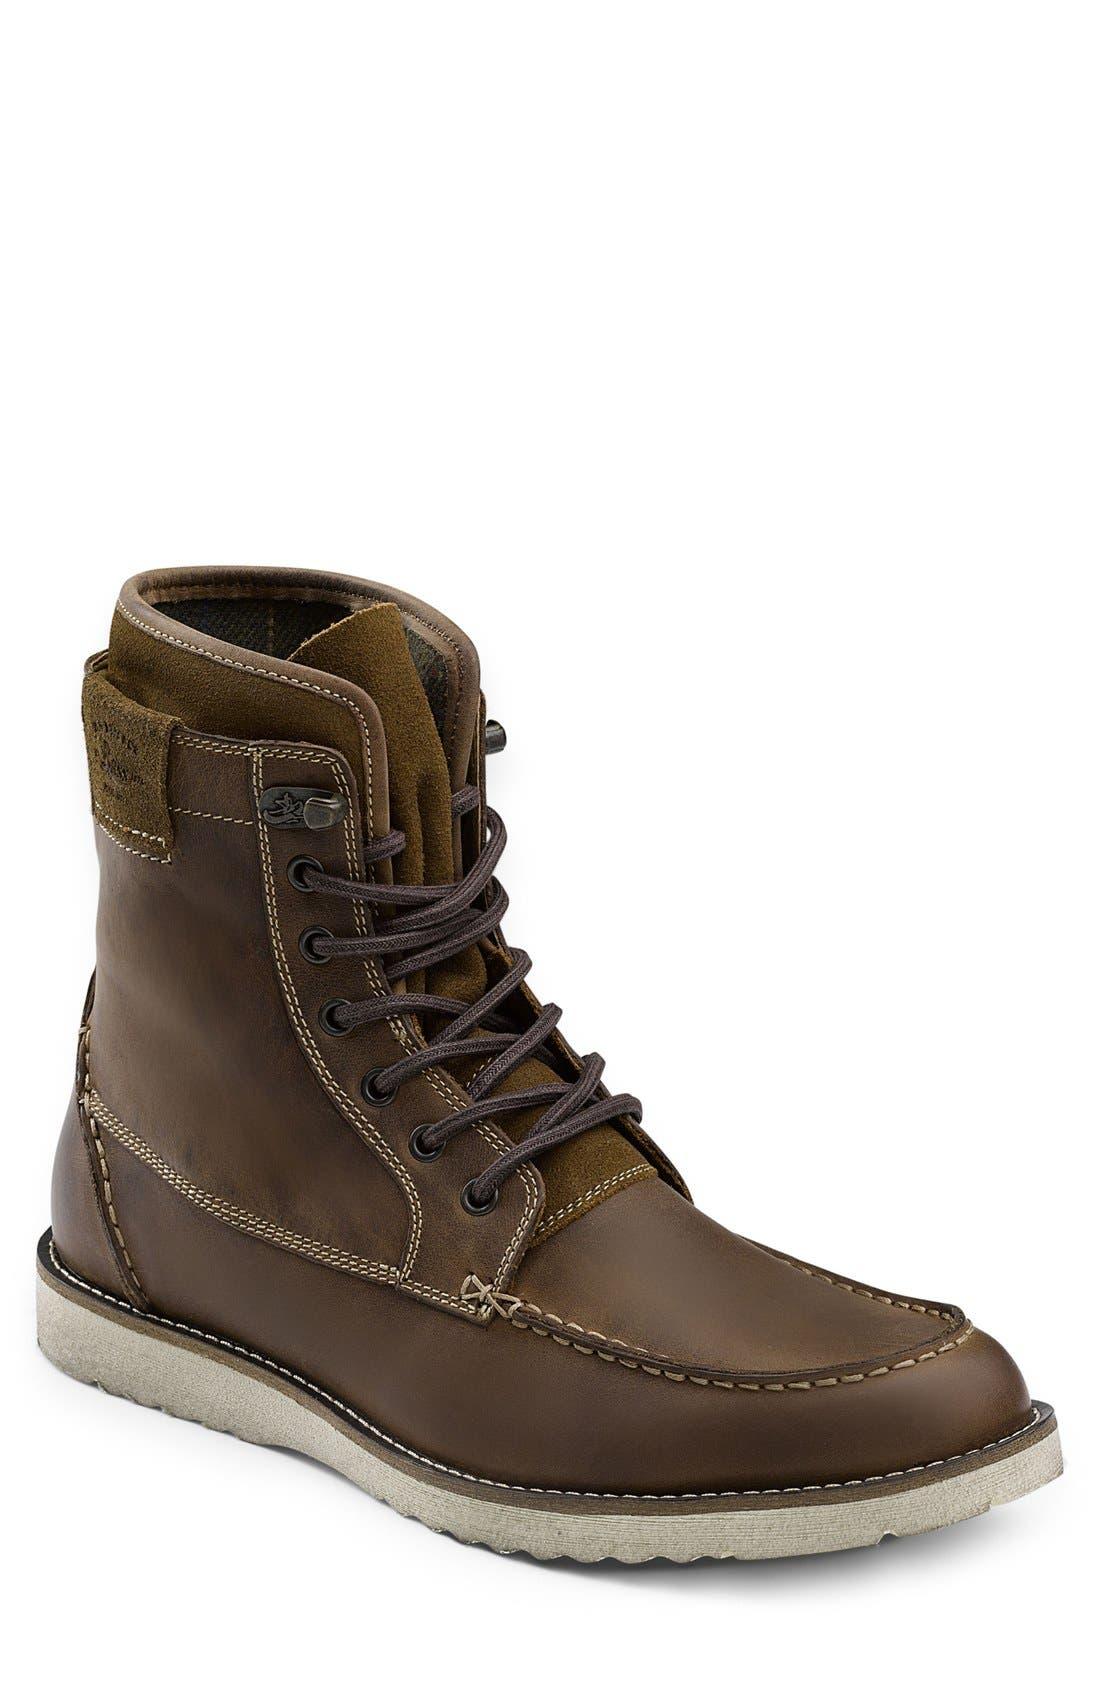 Moc Toe Boot,                         Main,                         color, 200